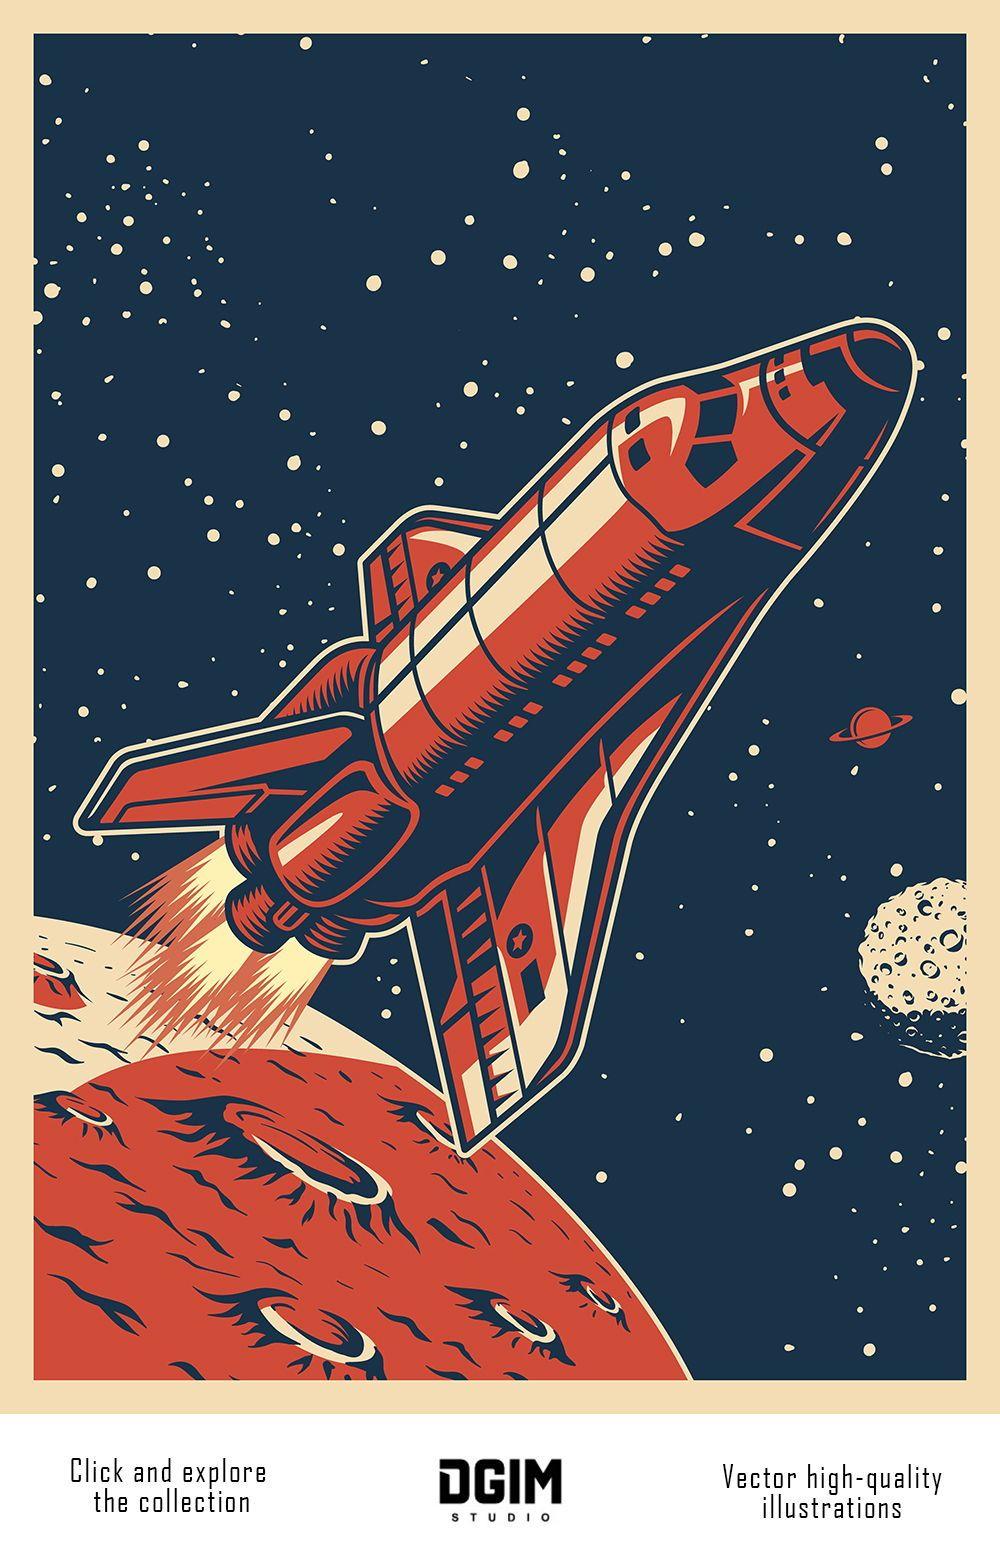 Vintage Space Emblems Set In 2020 Retro Space Posters Space Poster Design Vintage Space Poster